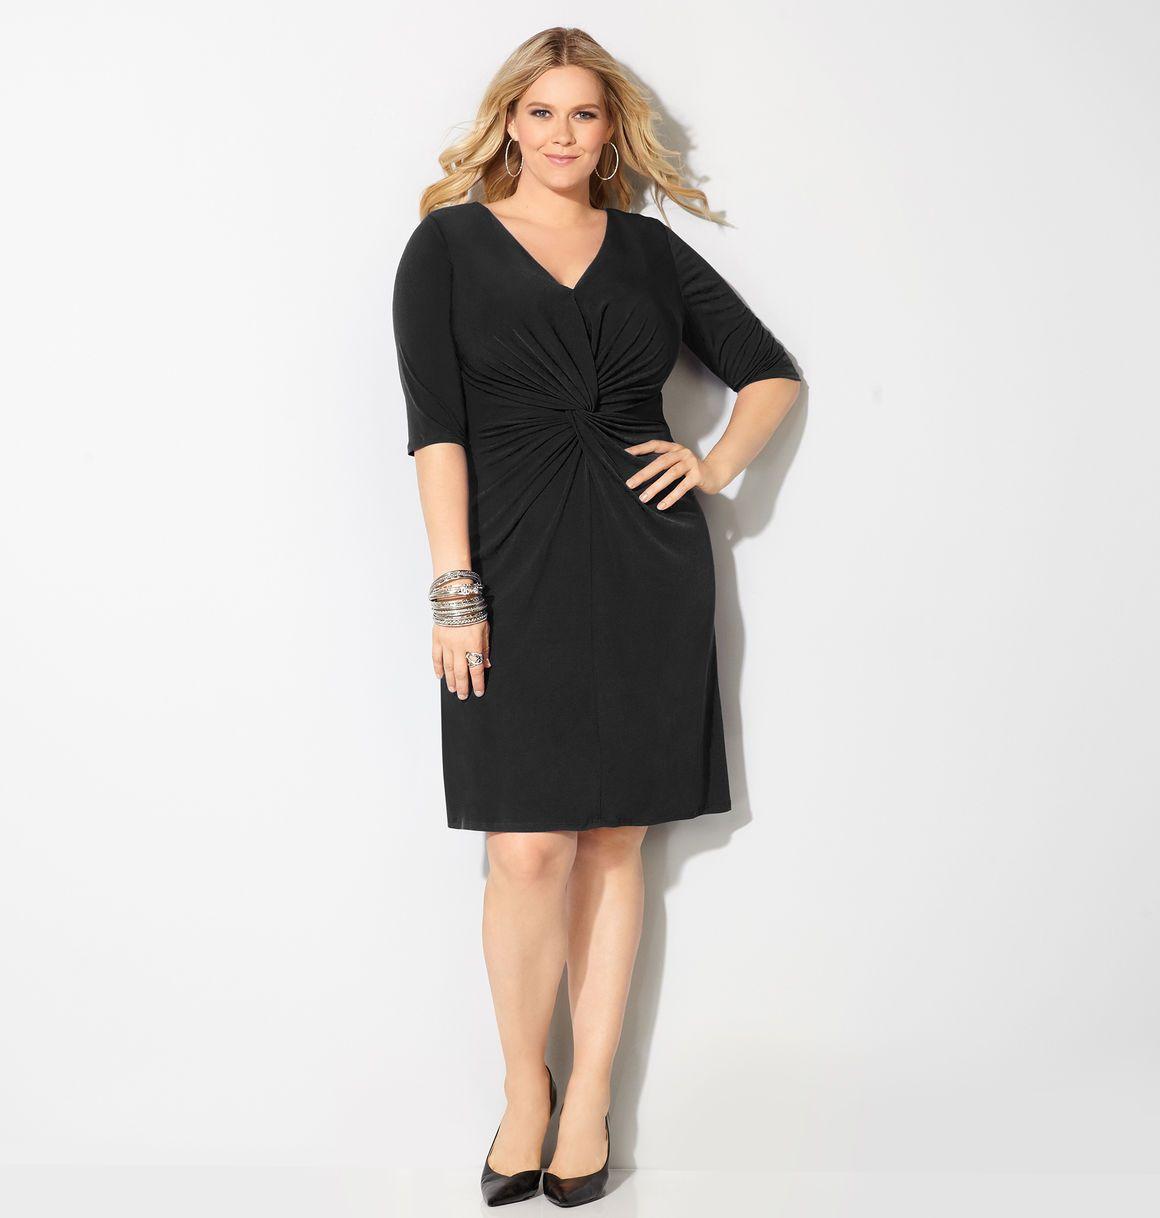 Plus Size Fashion Clothing Including Tops Pants Dresses Coats Suits Boots And More Avenue Plus Size Black Dresses Black Dress With Sleeves Black Dress [ 1218 x 1160 Pixel ]